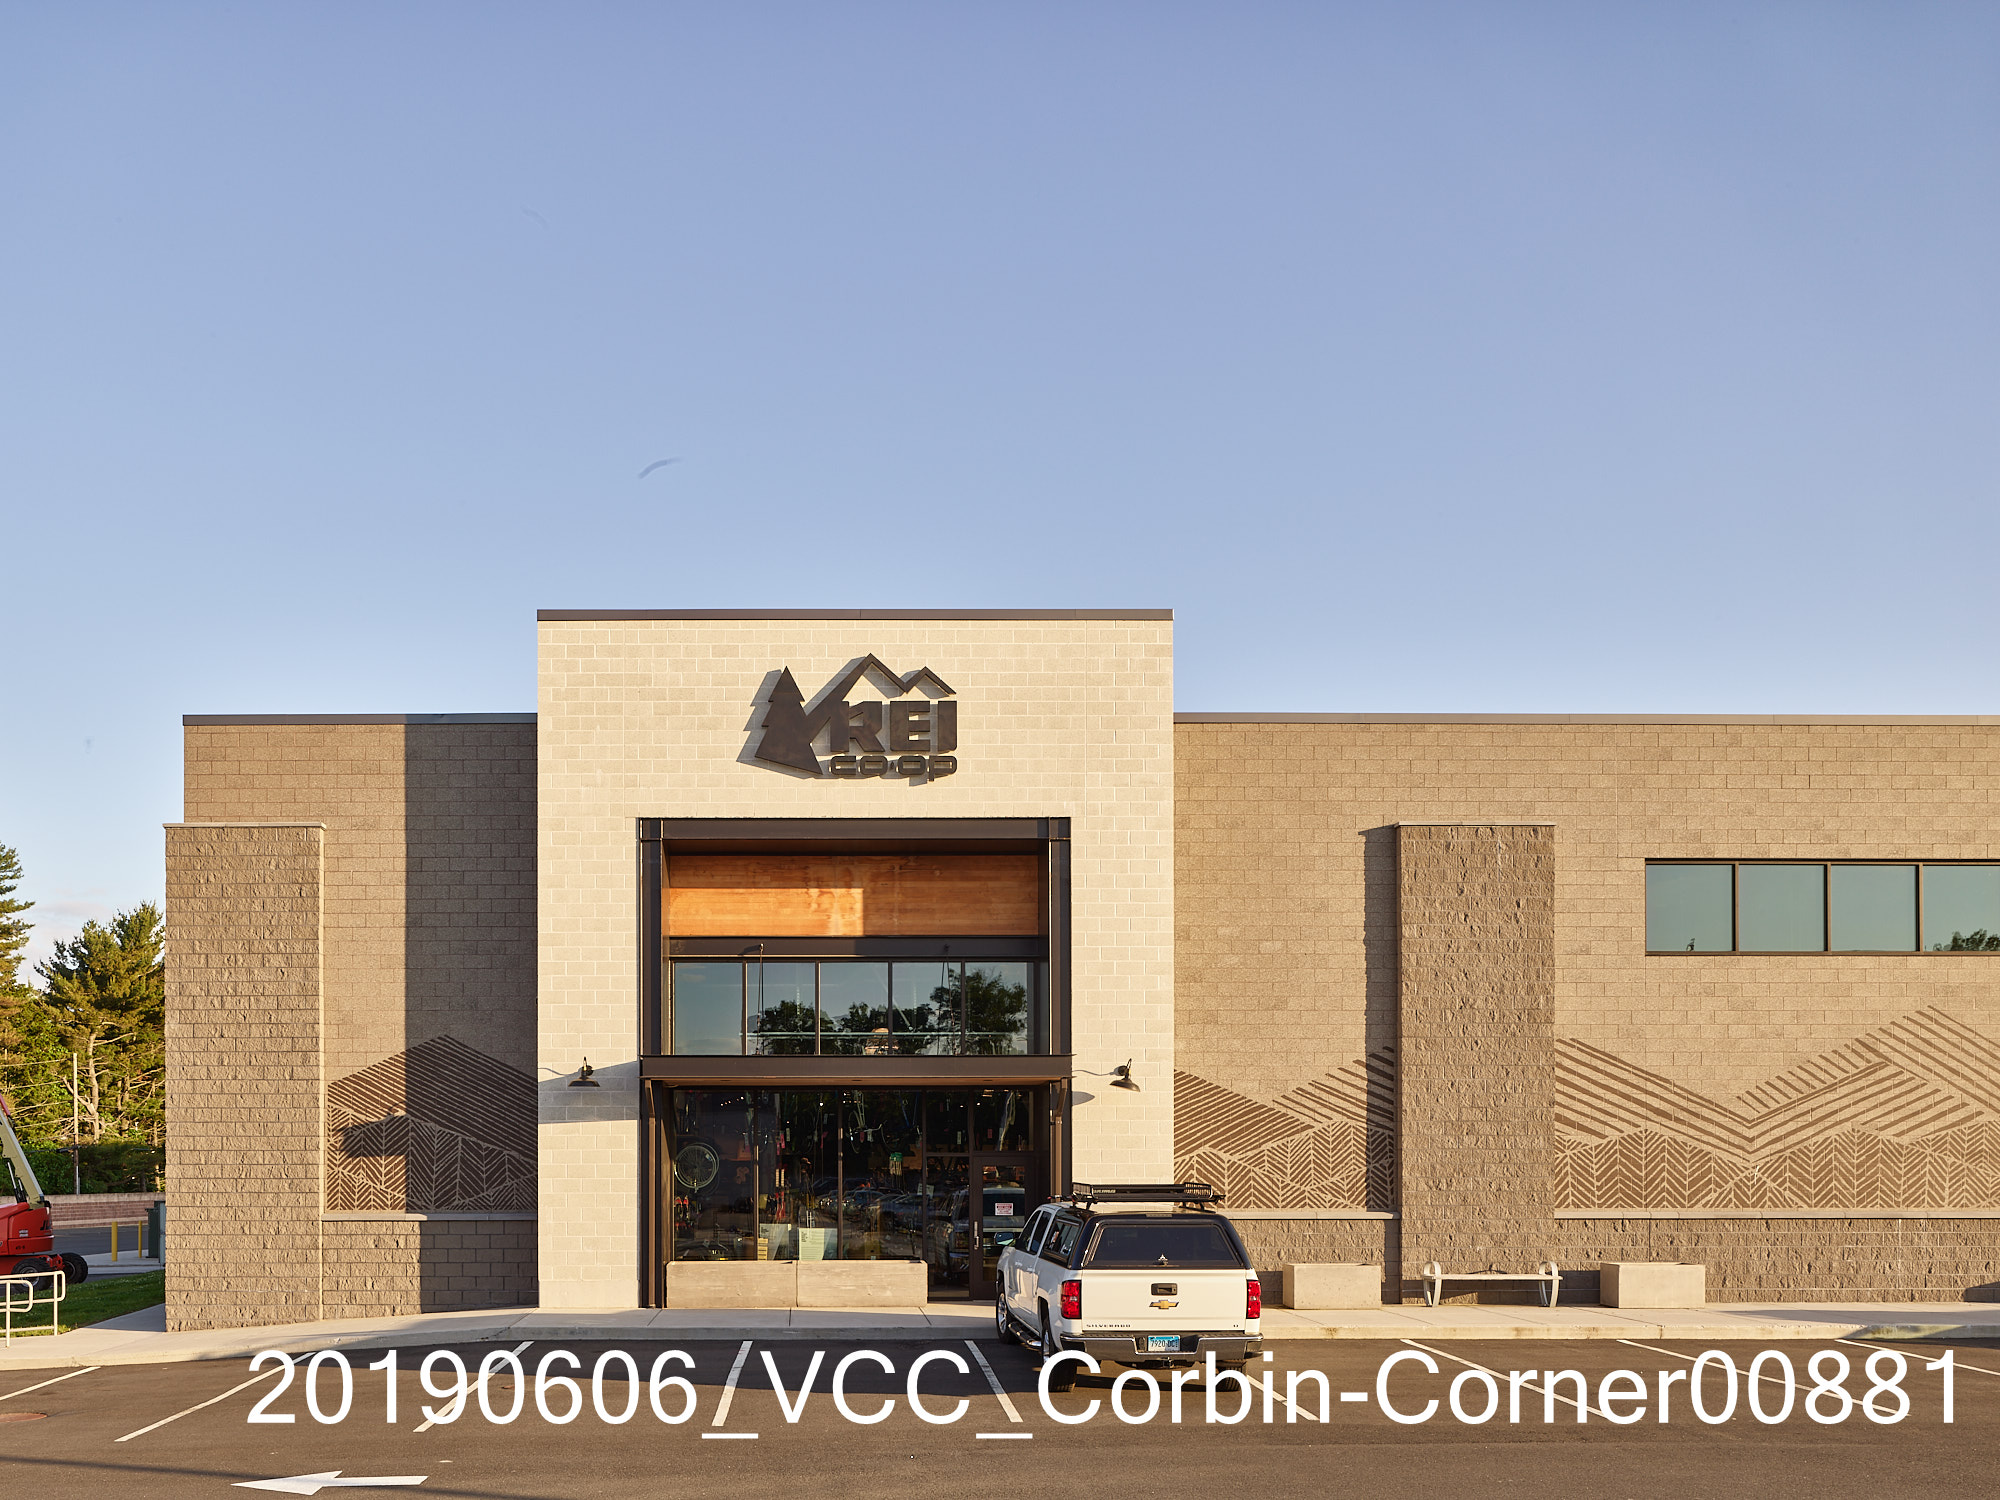 20190606_VCC_Corbin-Corner00881.jpg